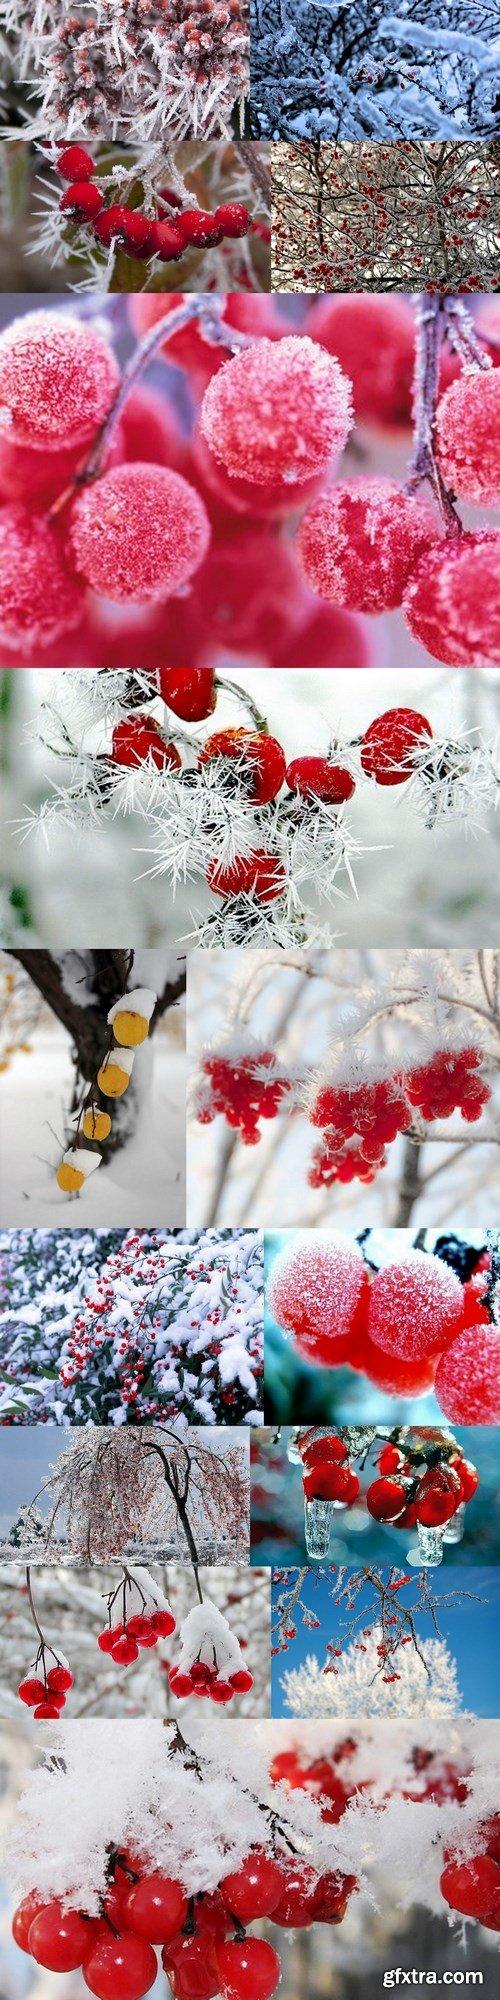 berries in winter - 15 UHQ JPEG